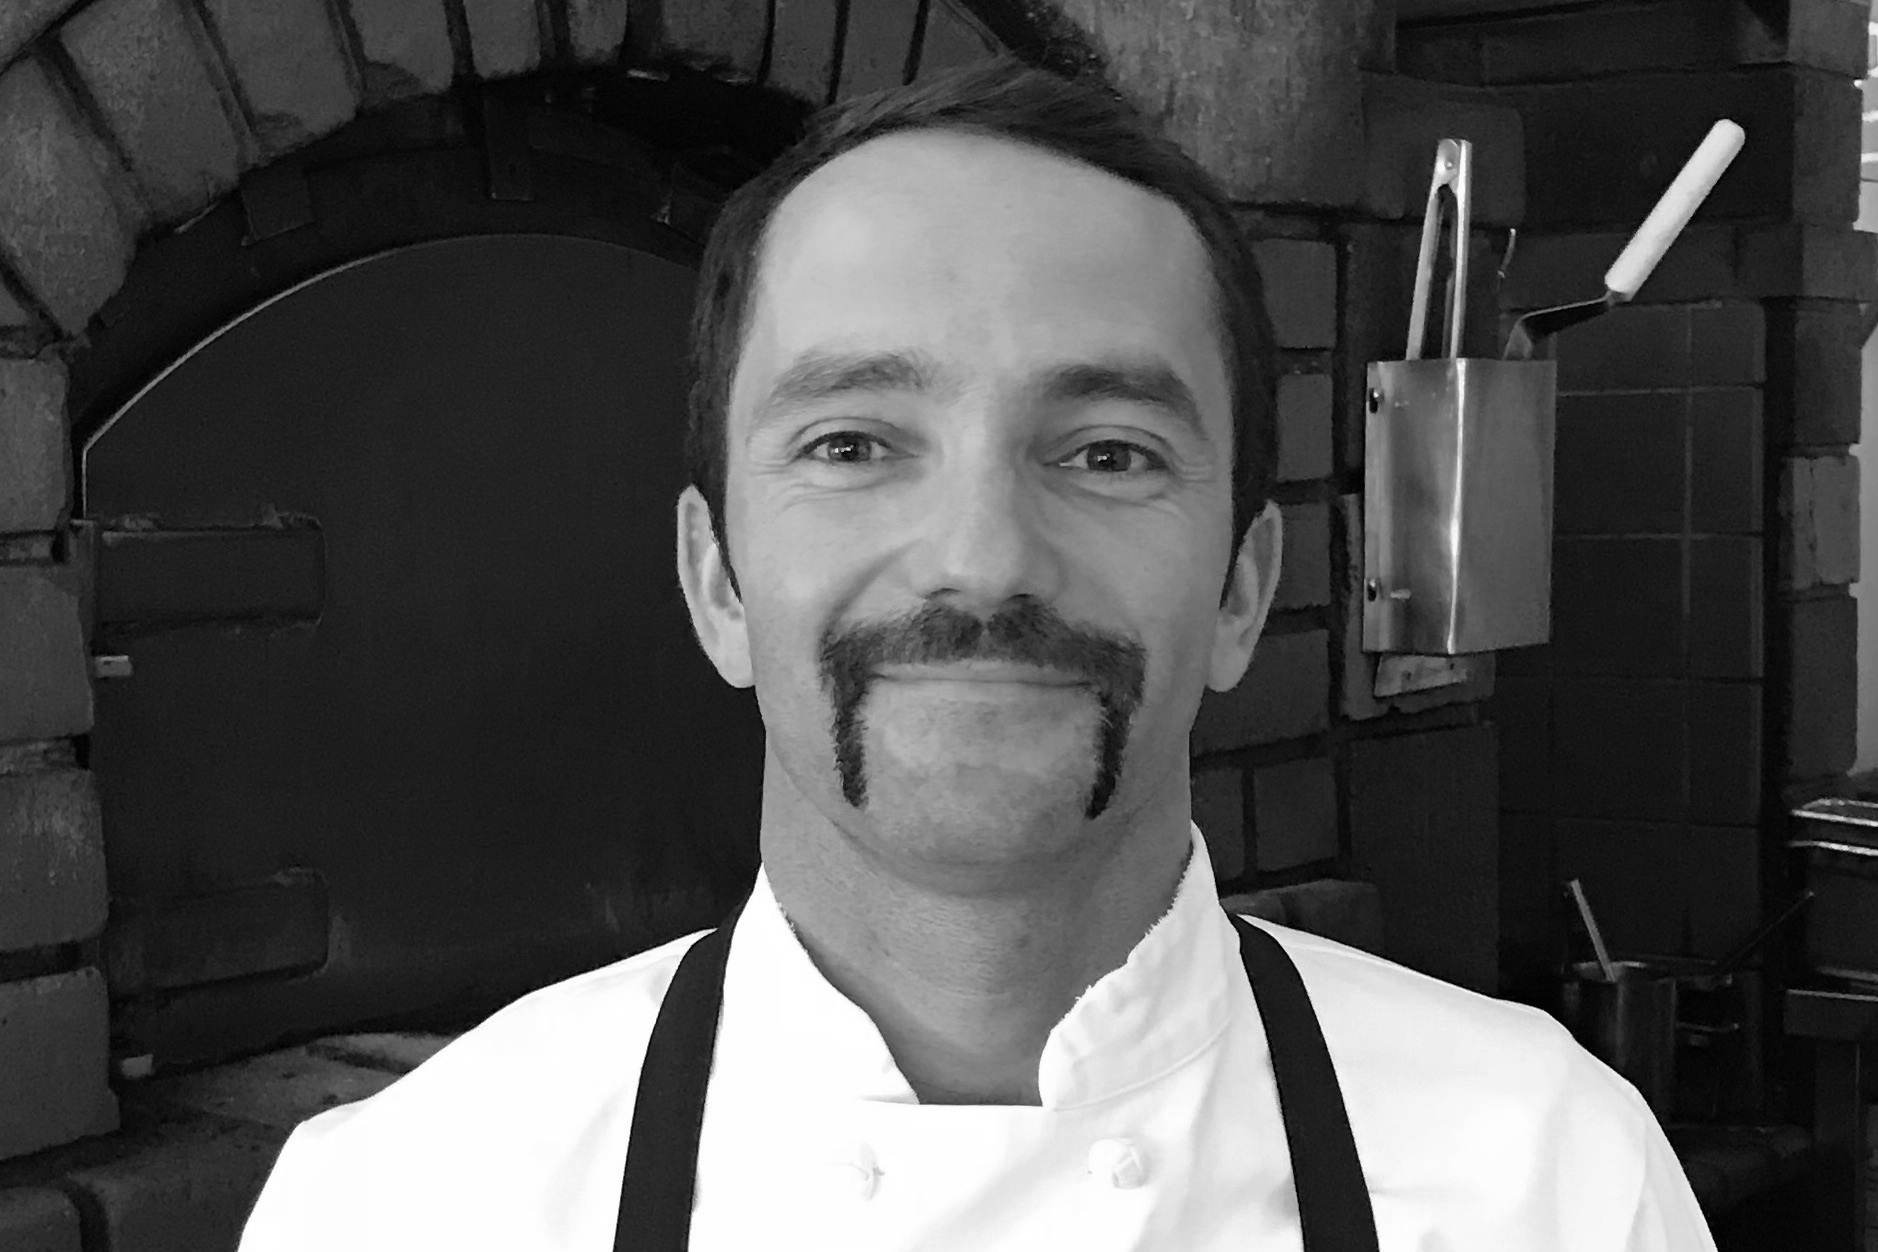 Nate Norris of Zuni Cafe